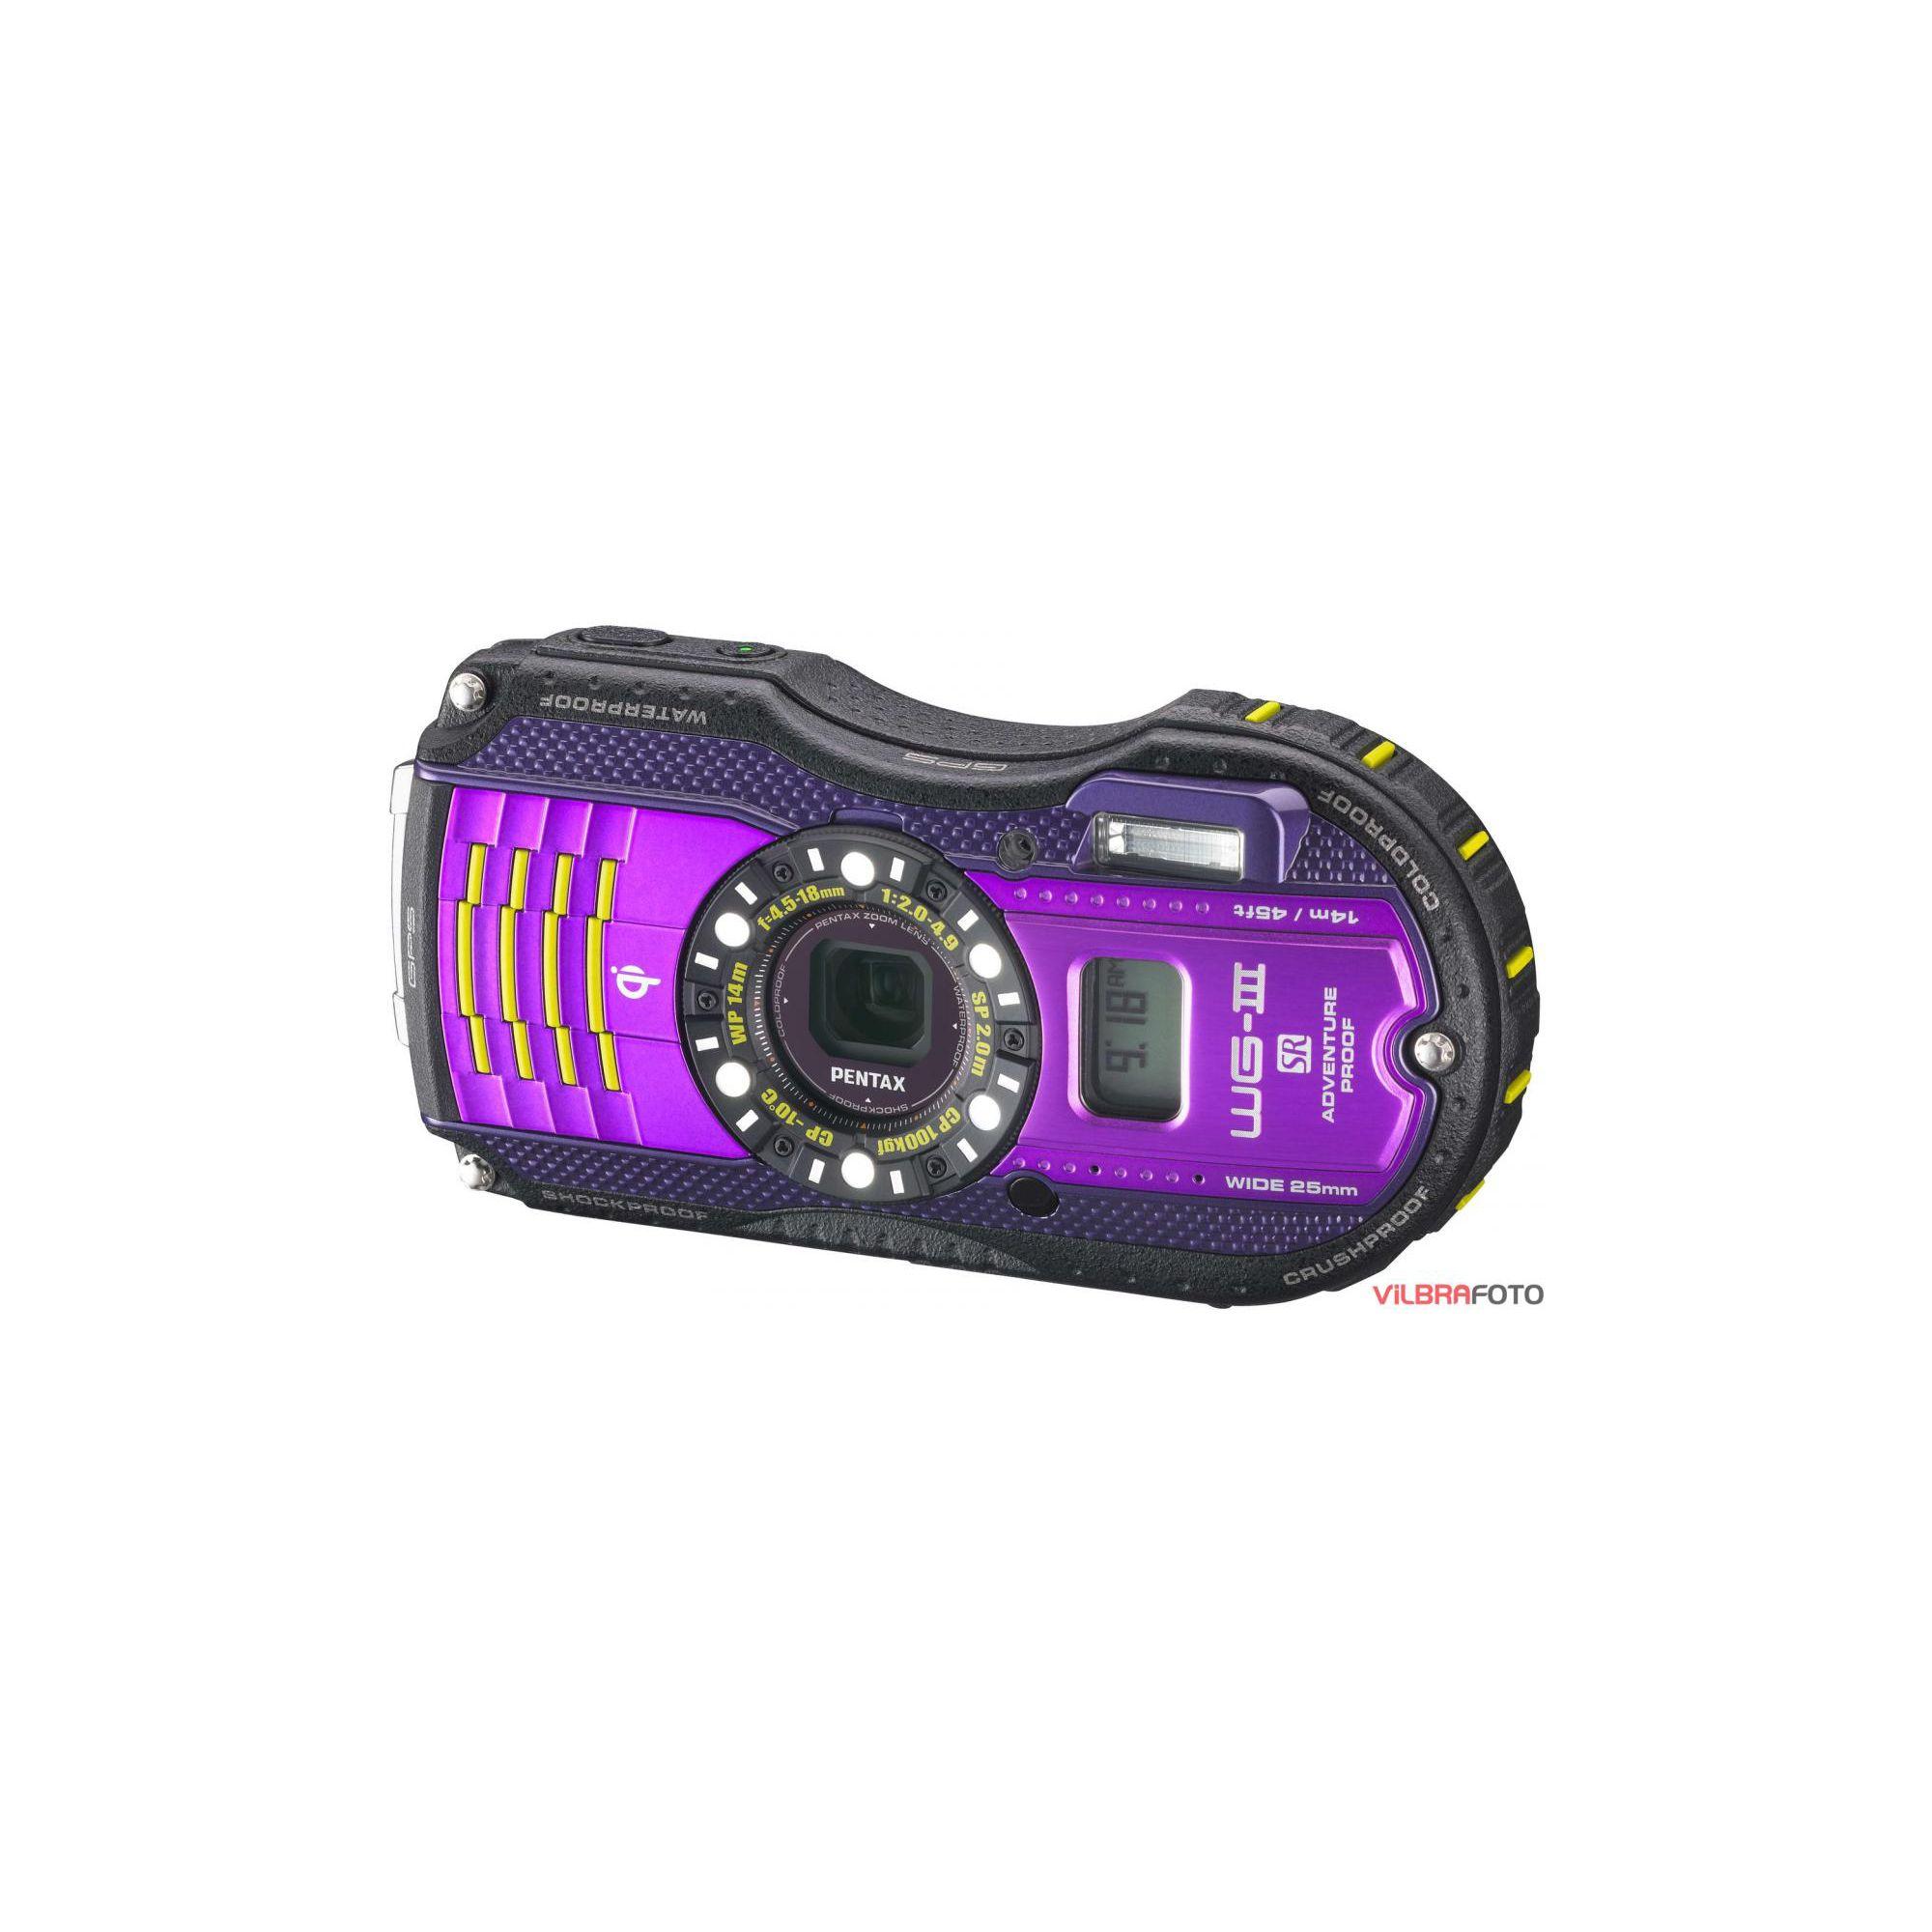 Pentax WG-3 Digital Camera, Purple, 16MP, 4x Optical Zoom, 3.0 inch LCD Screen